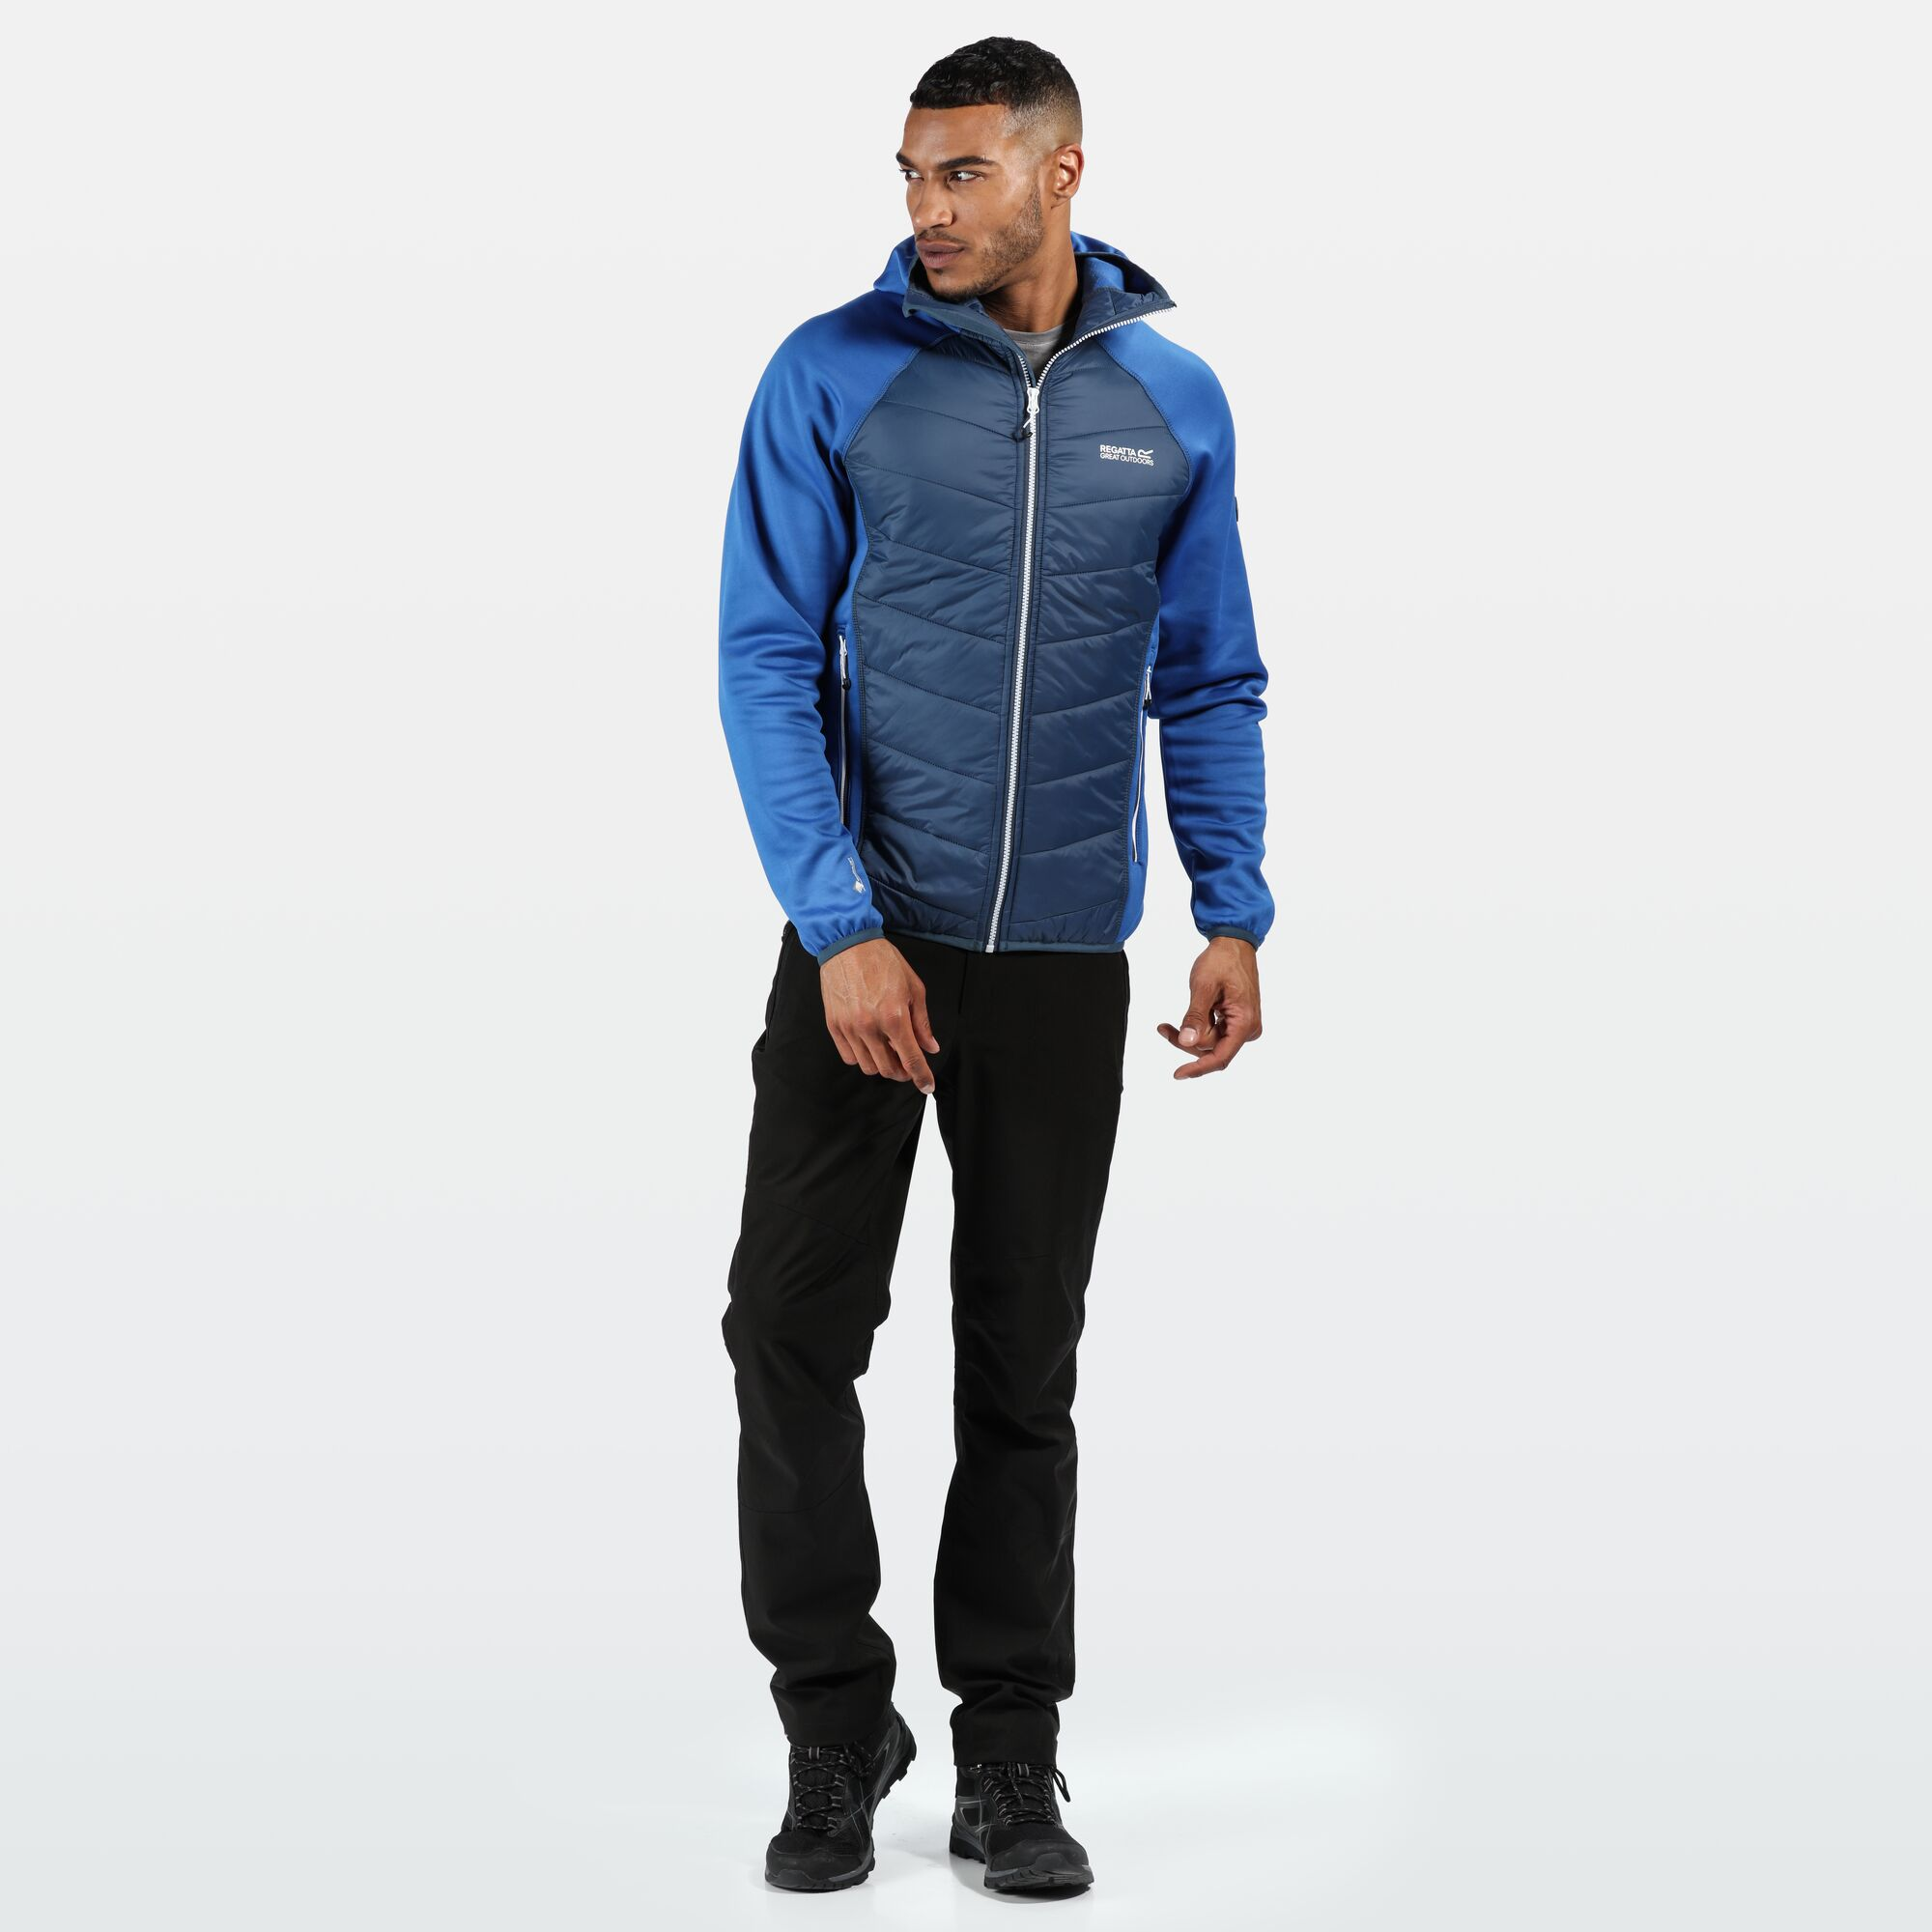 Regatta Men/'s Andreson IV Lightweight Insulated Hybrid Walking Jacket Blue